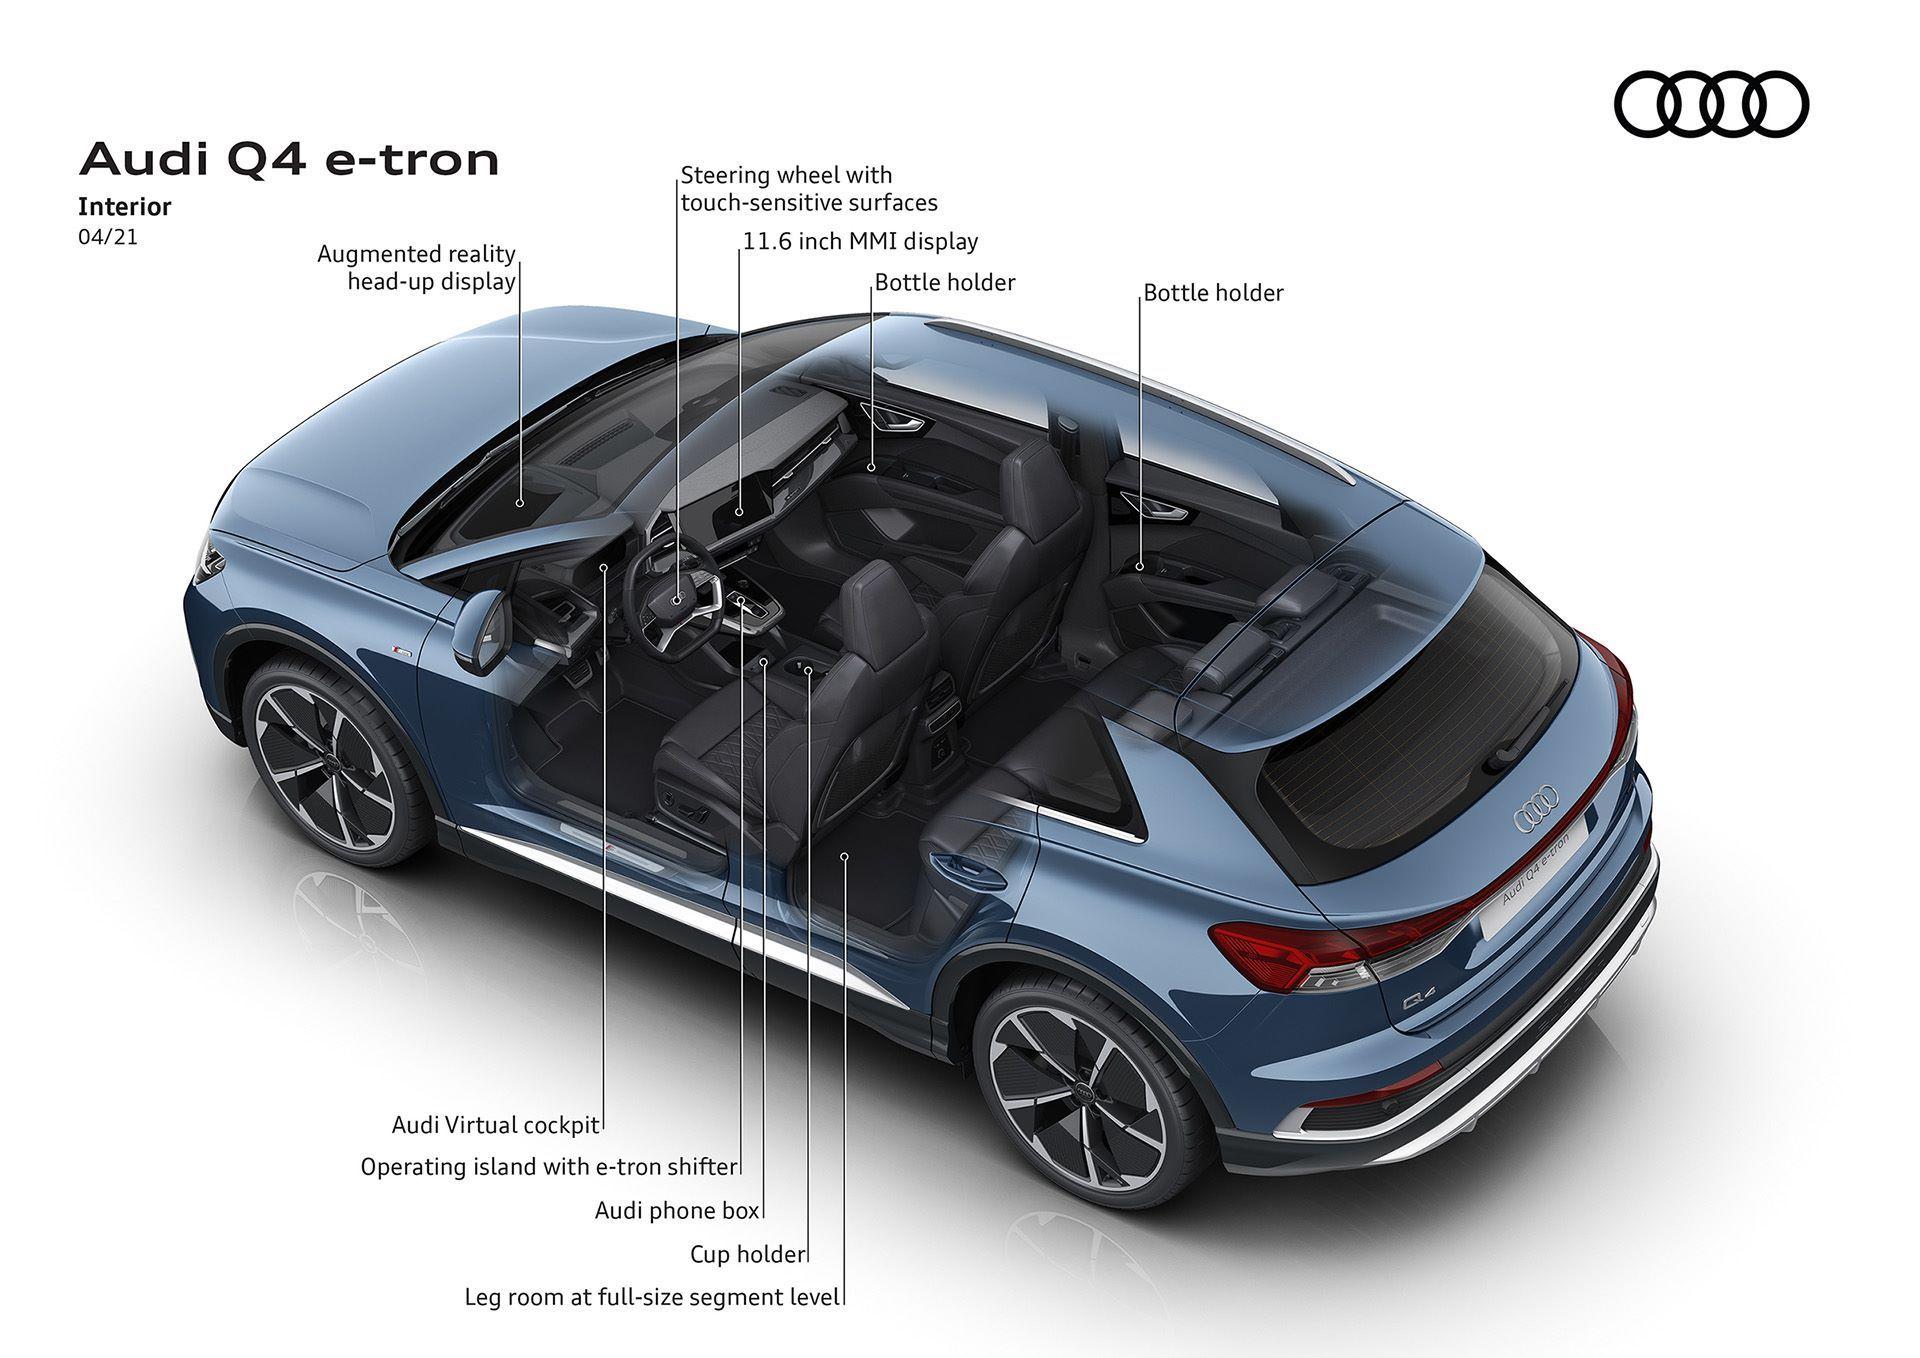 Audi-Q4-e-tron-and-Q4-e-tron-Sportback-167